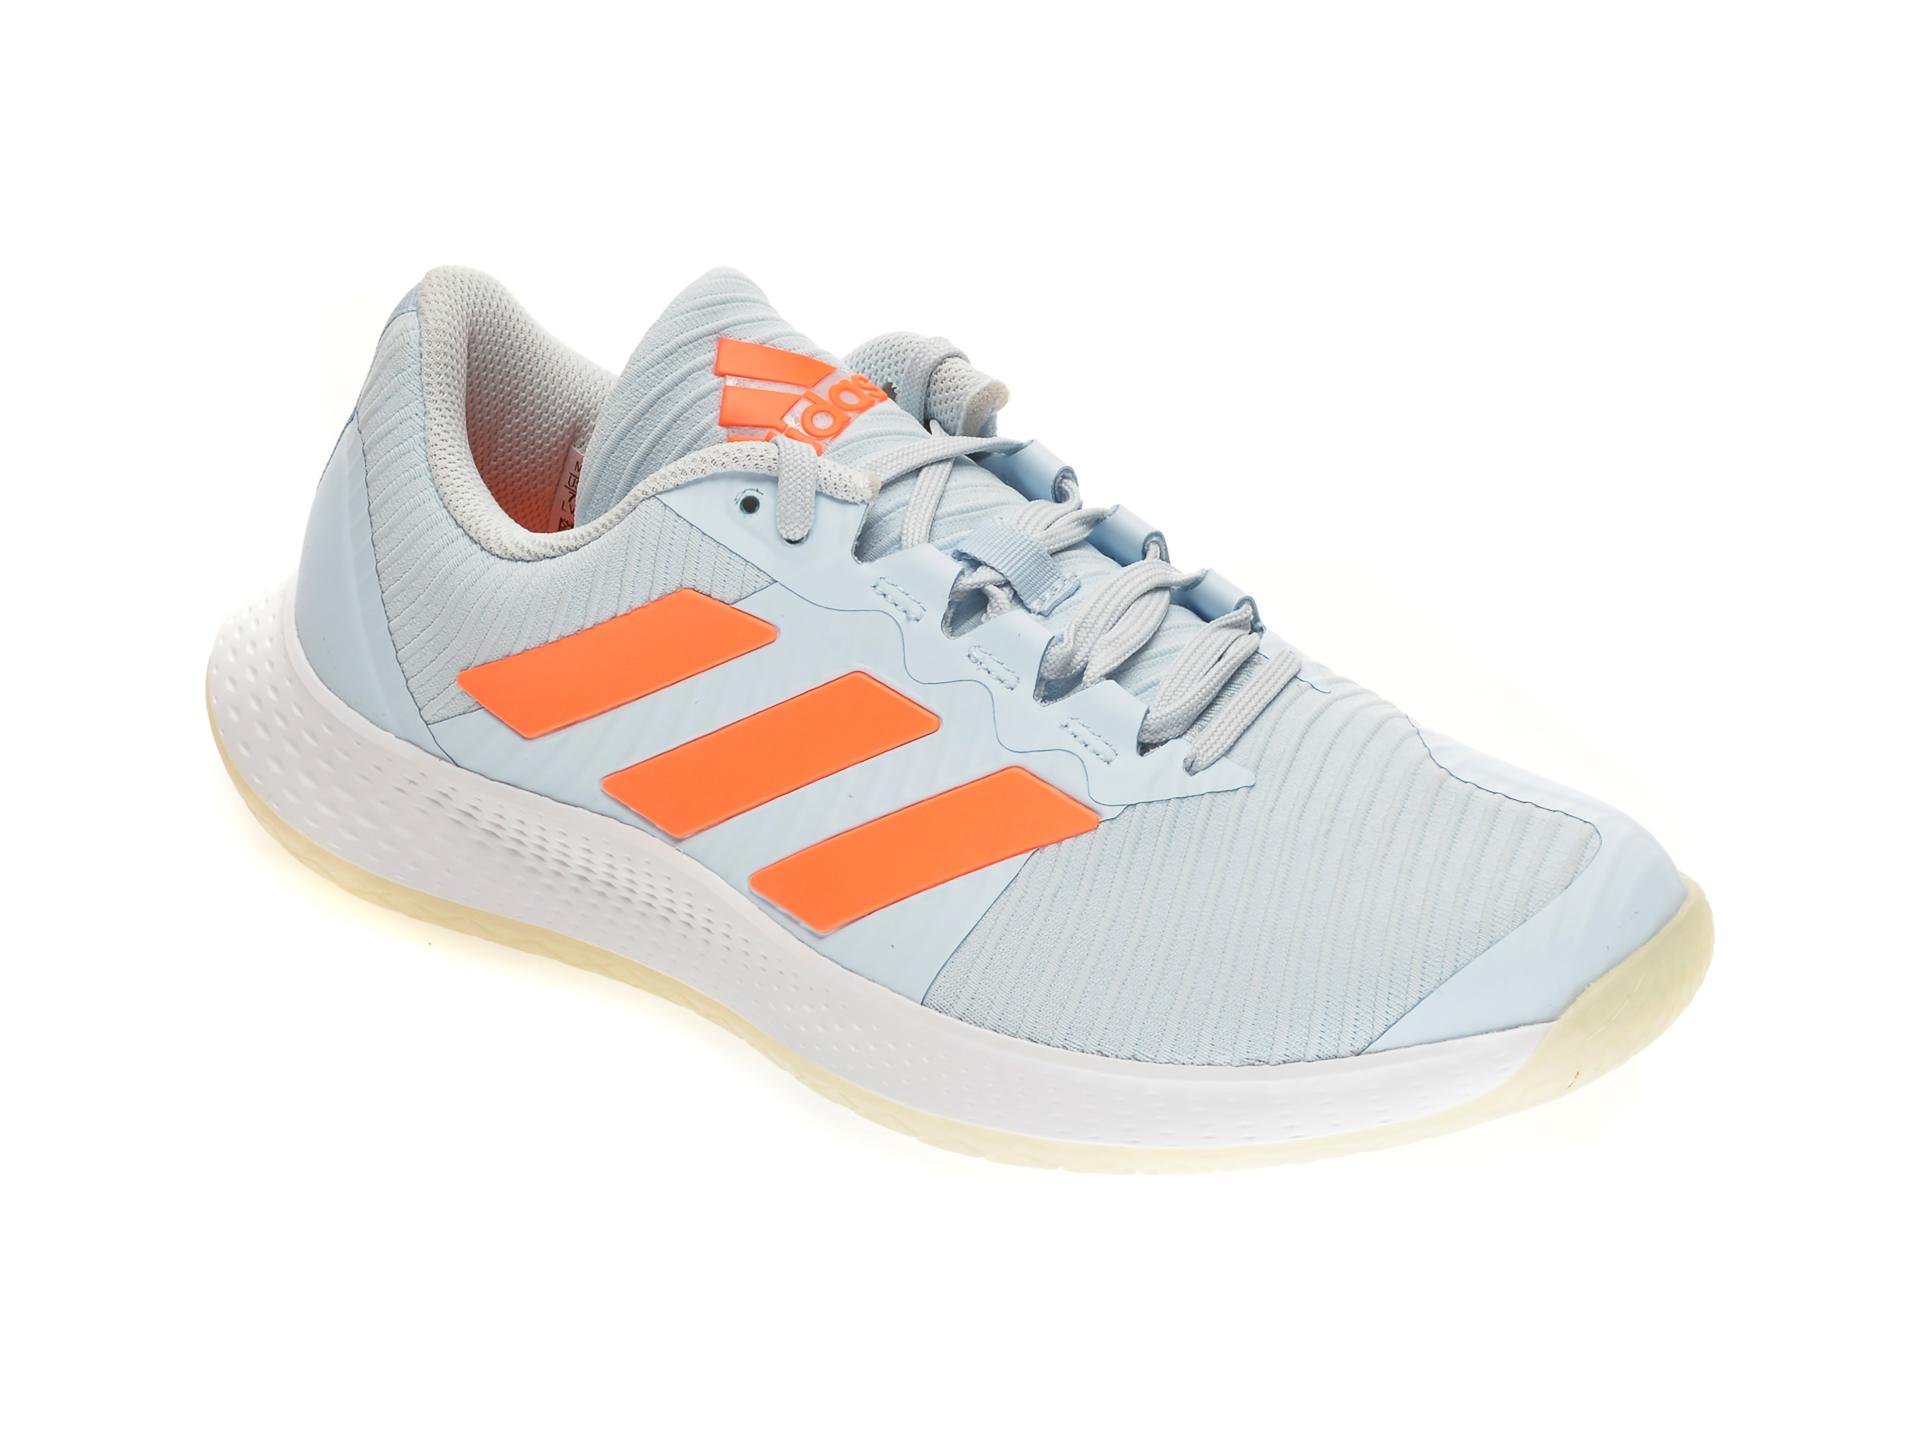 Pantofi sport ADIDAS albastri, FORCEBOUNCE W, din piele ecologica si material textil